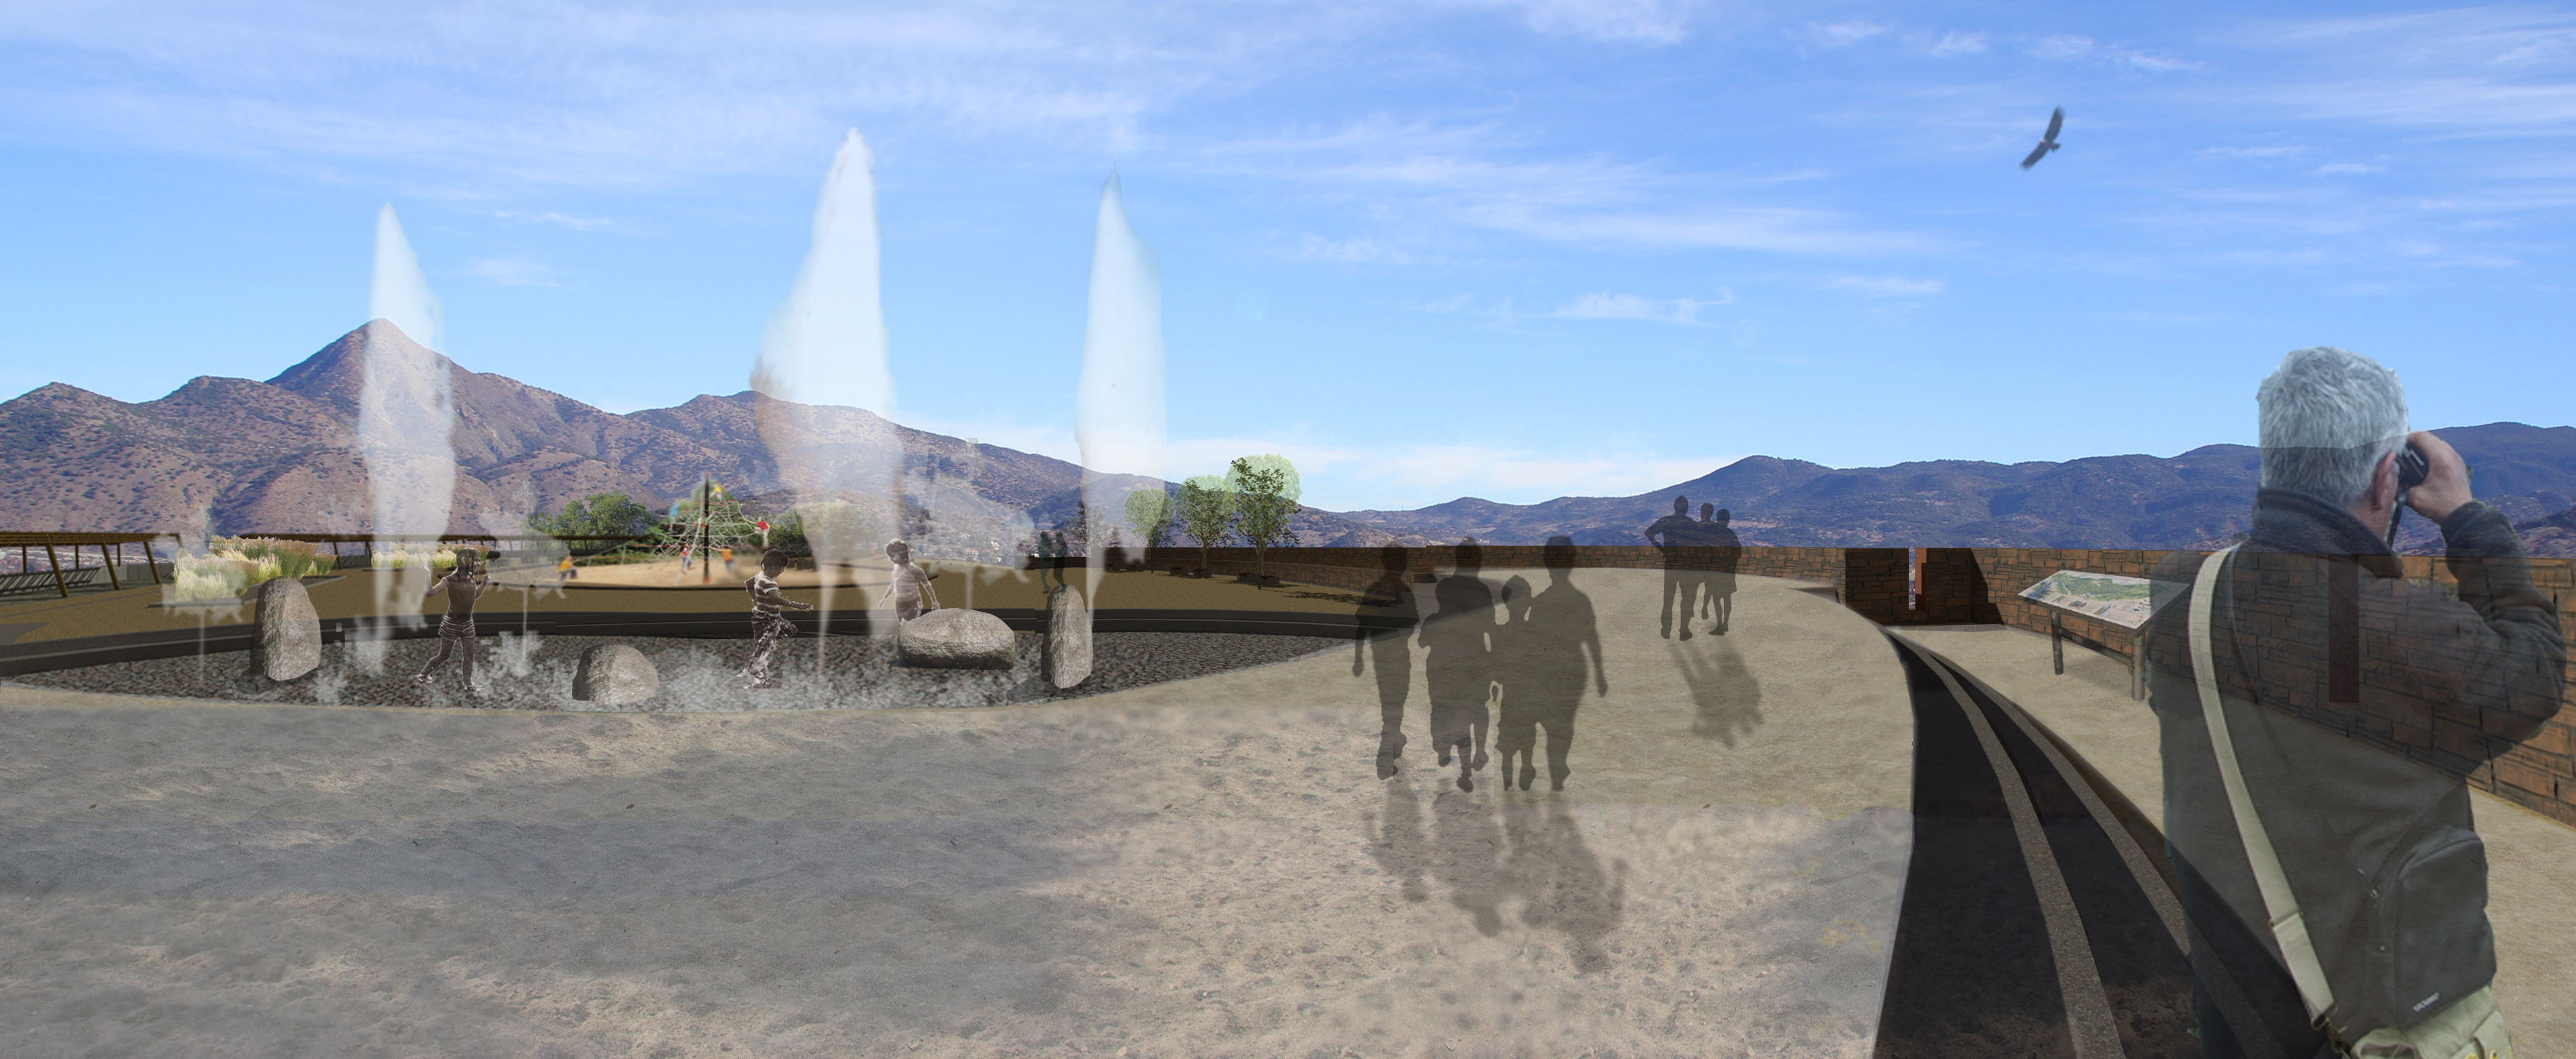 plaza juegos de agua